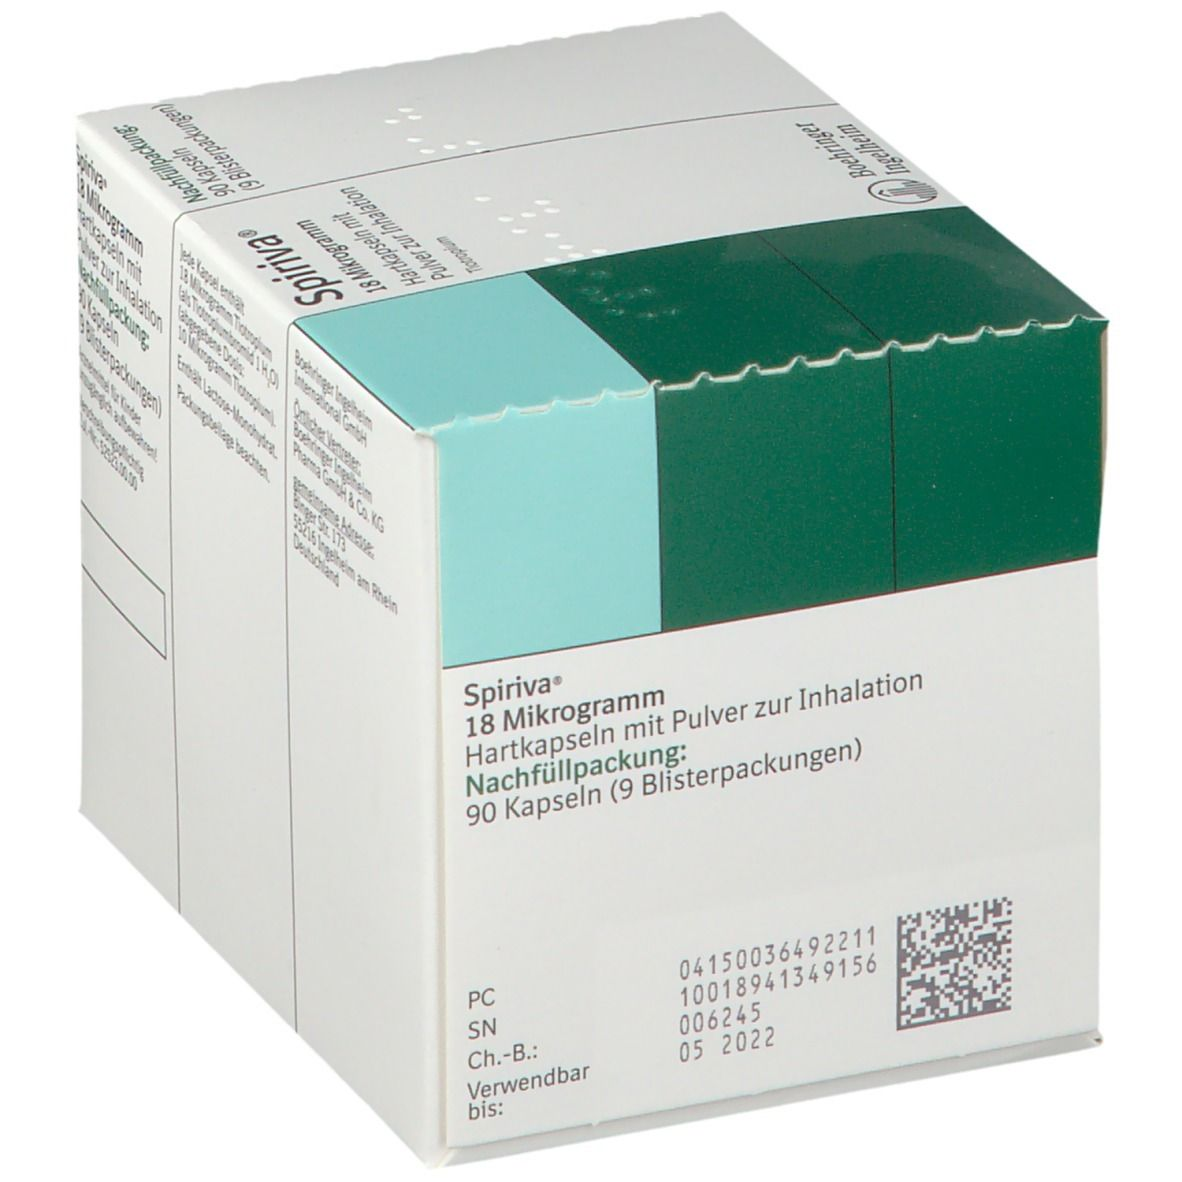 Spiriva handihaler 18 mg sleep aid